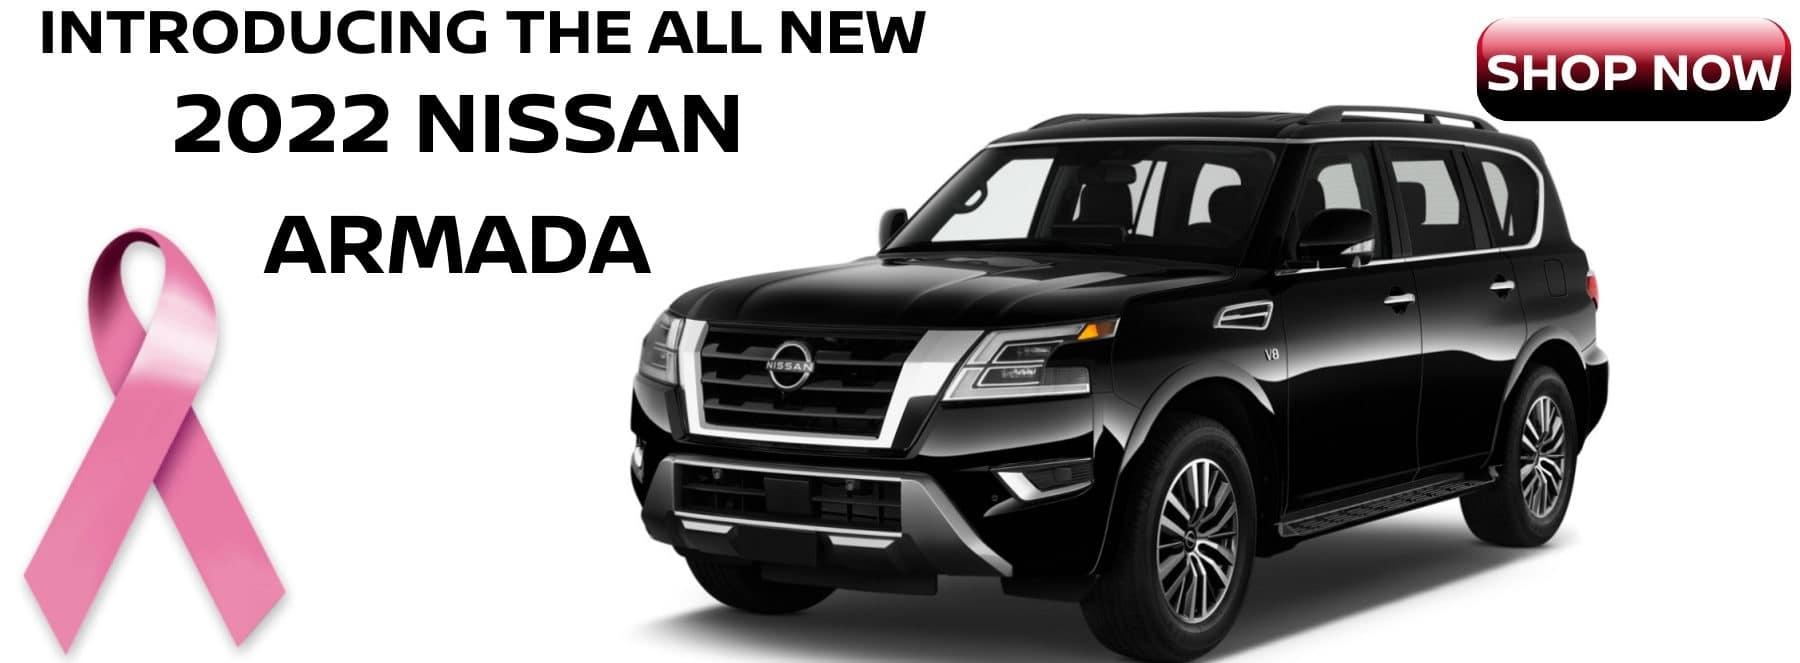 NissanArmada